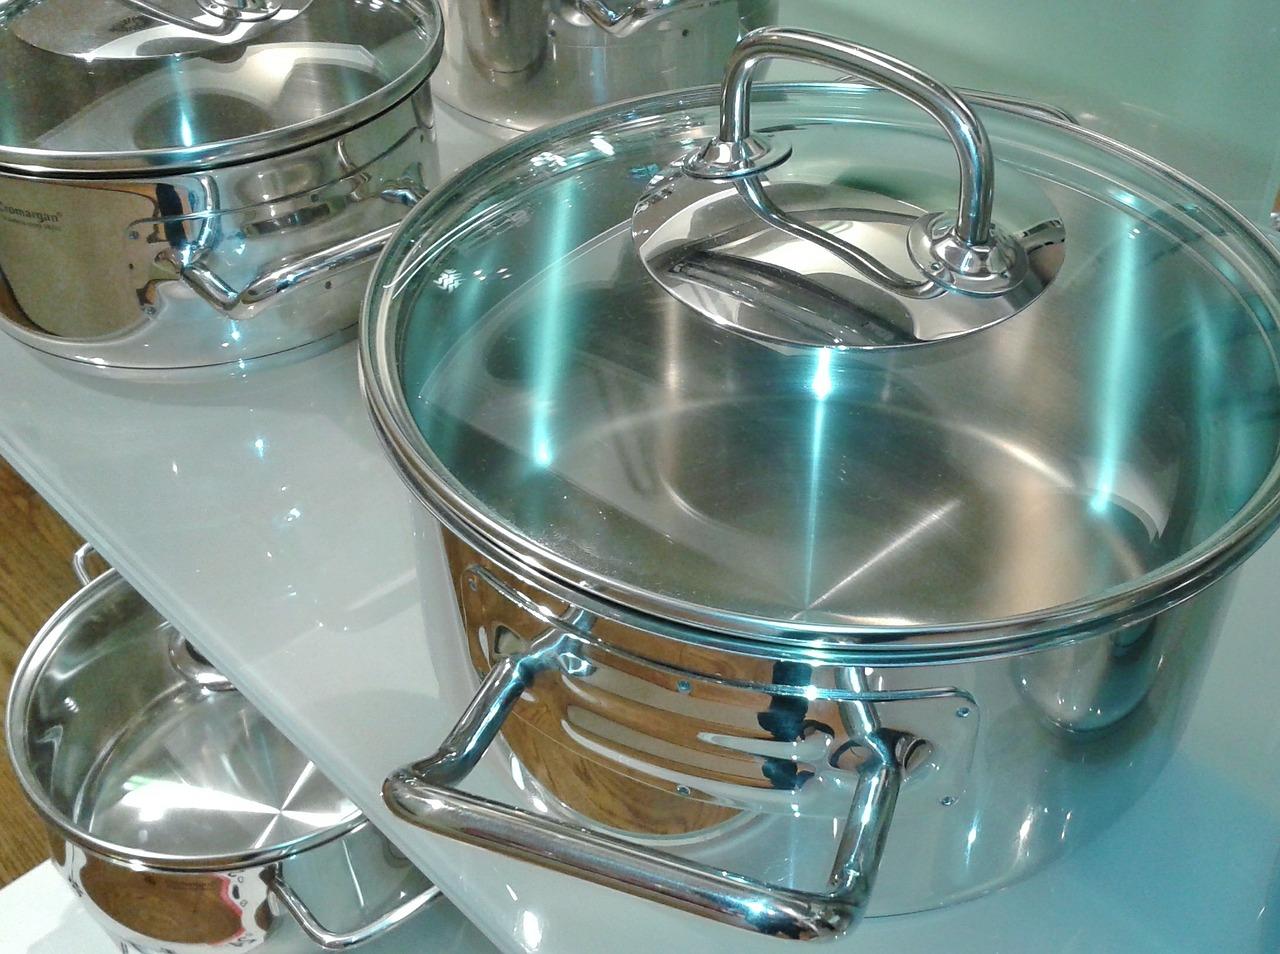 Hogar diez: 5 trucos para limpiar tus utensilios de cocina